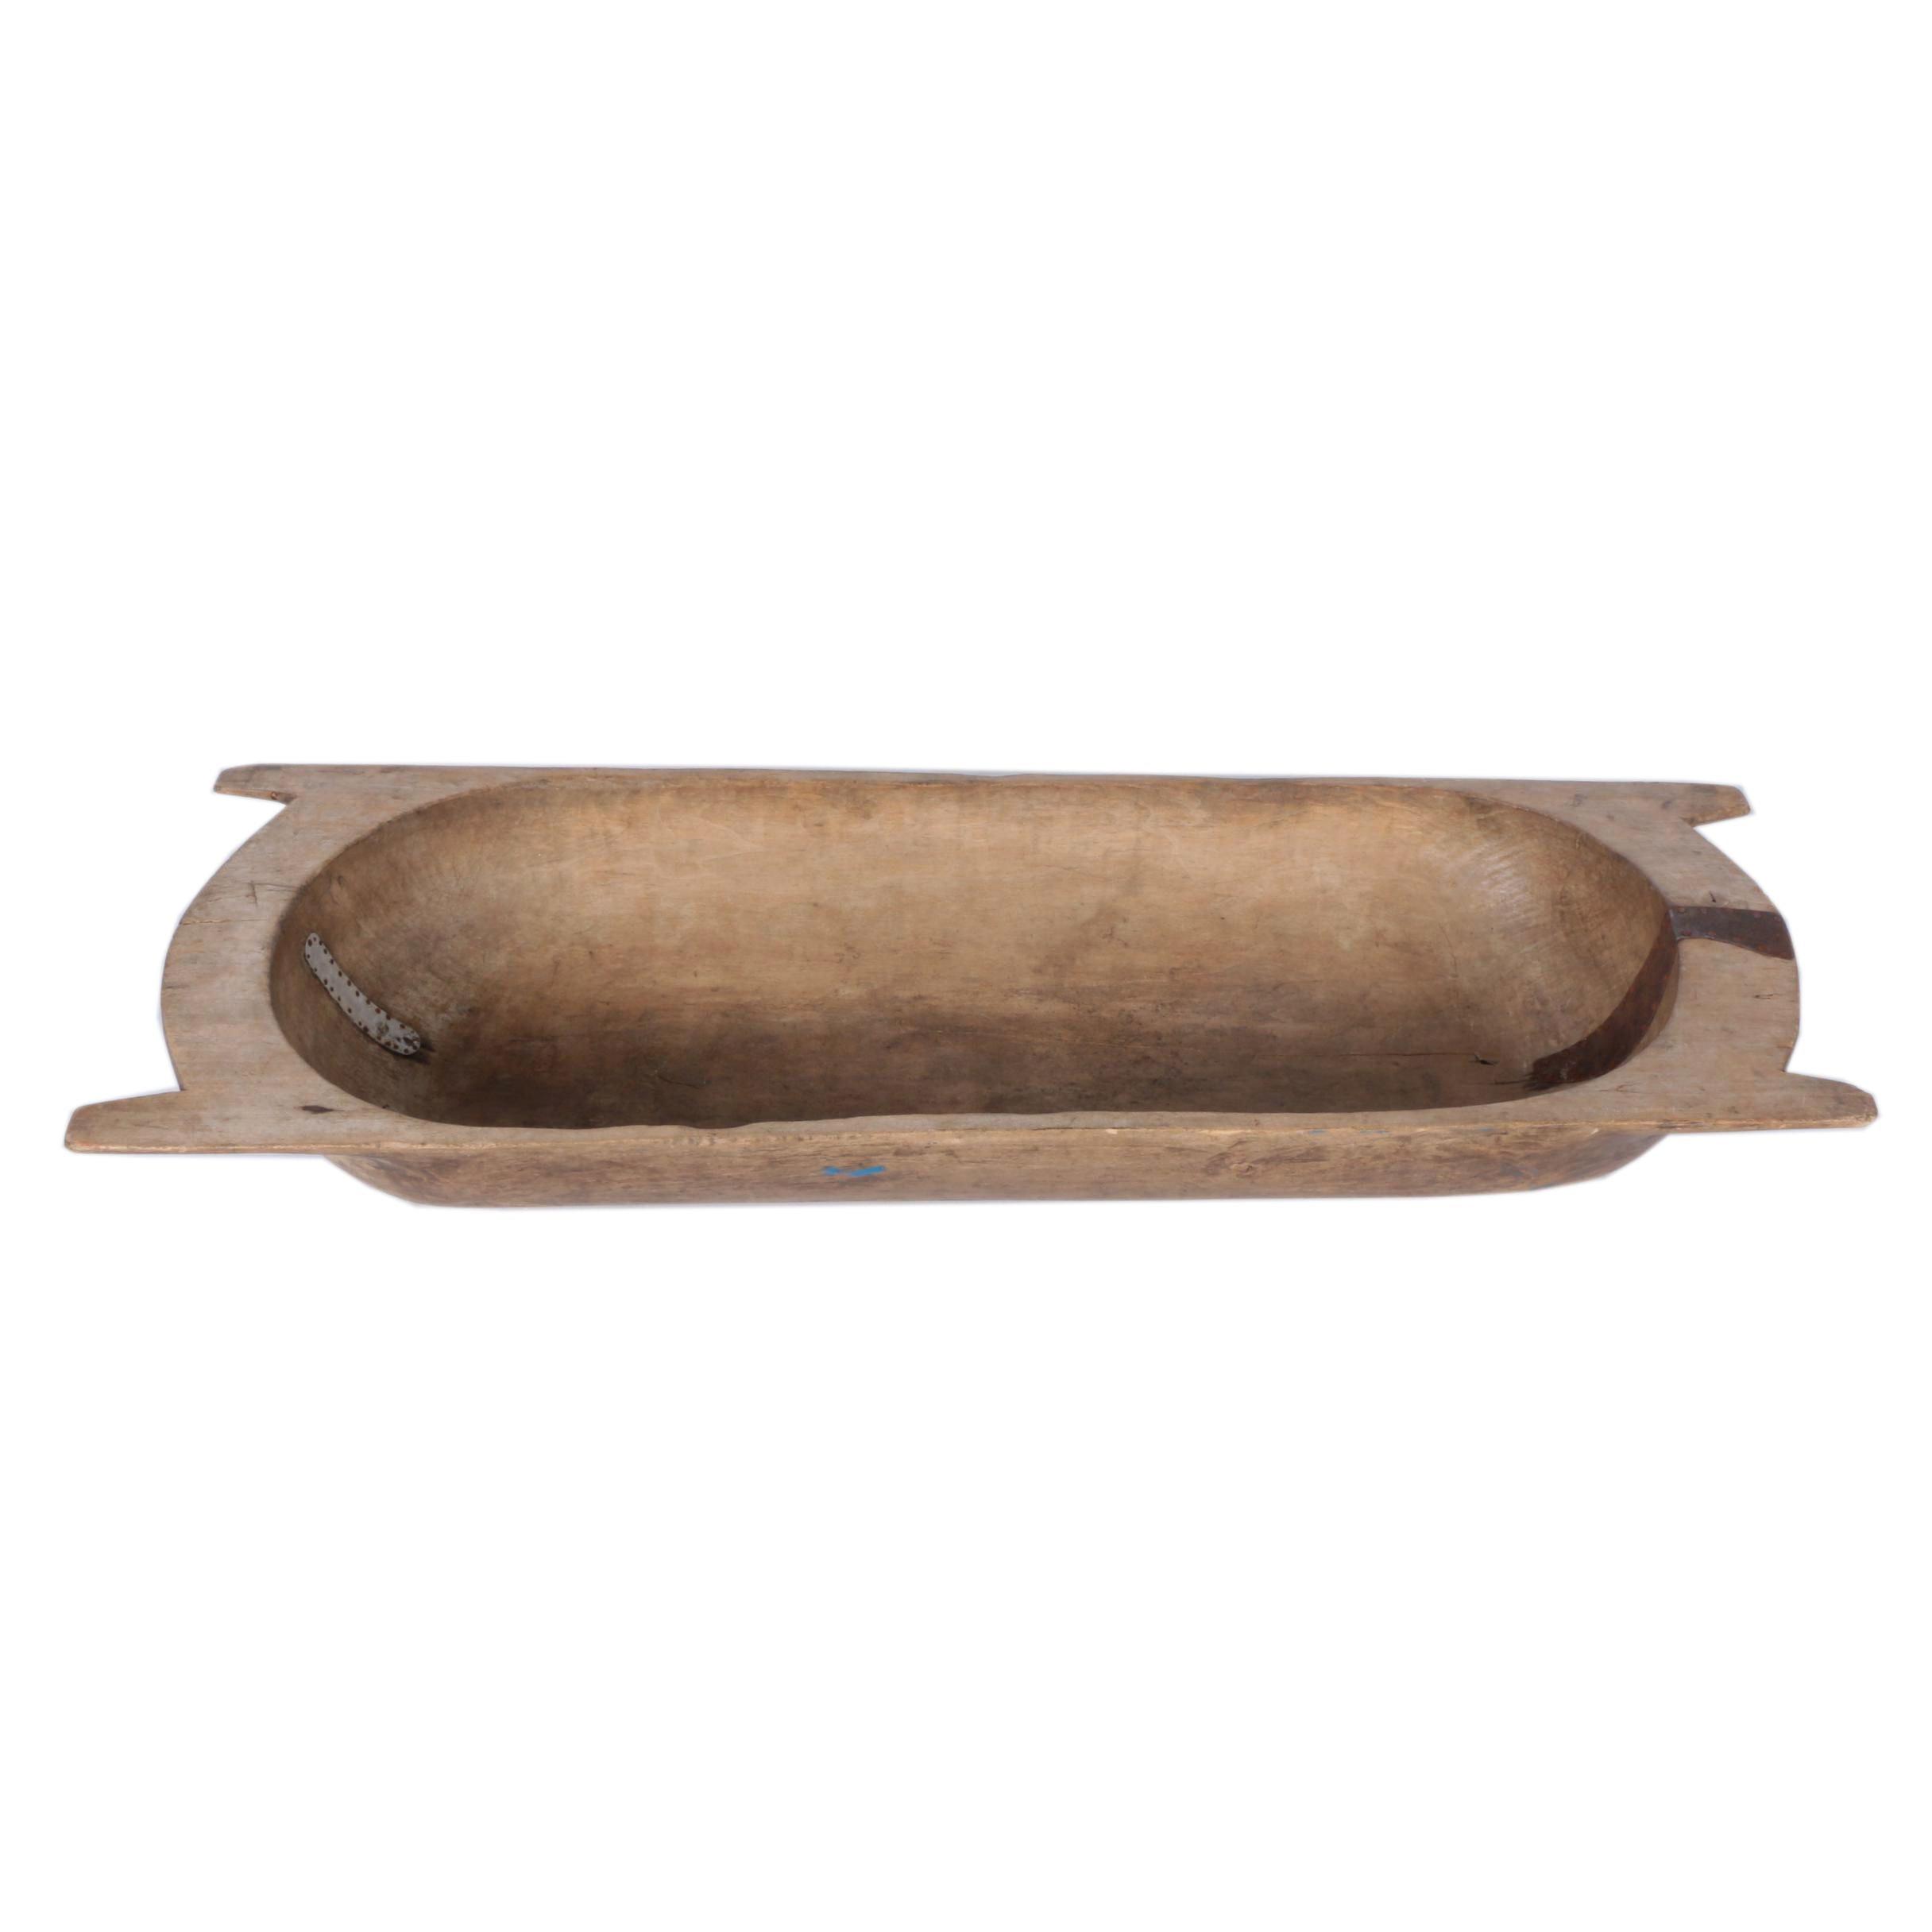 Antique Wooden Dough Bowl Trencher